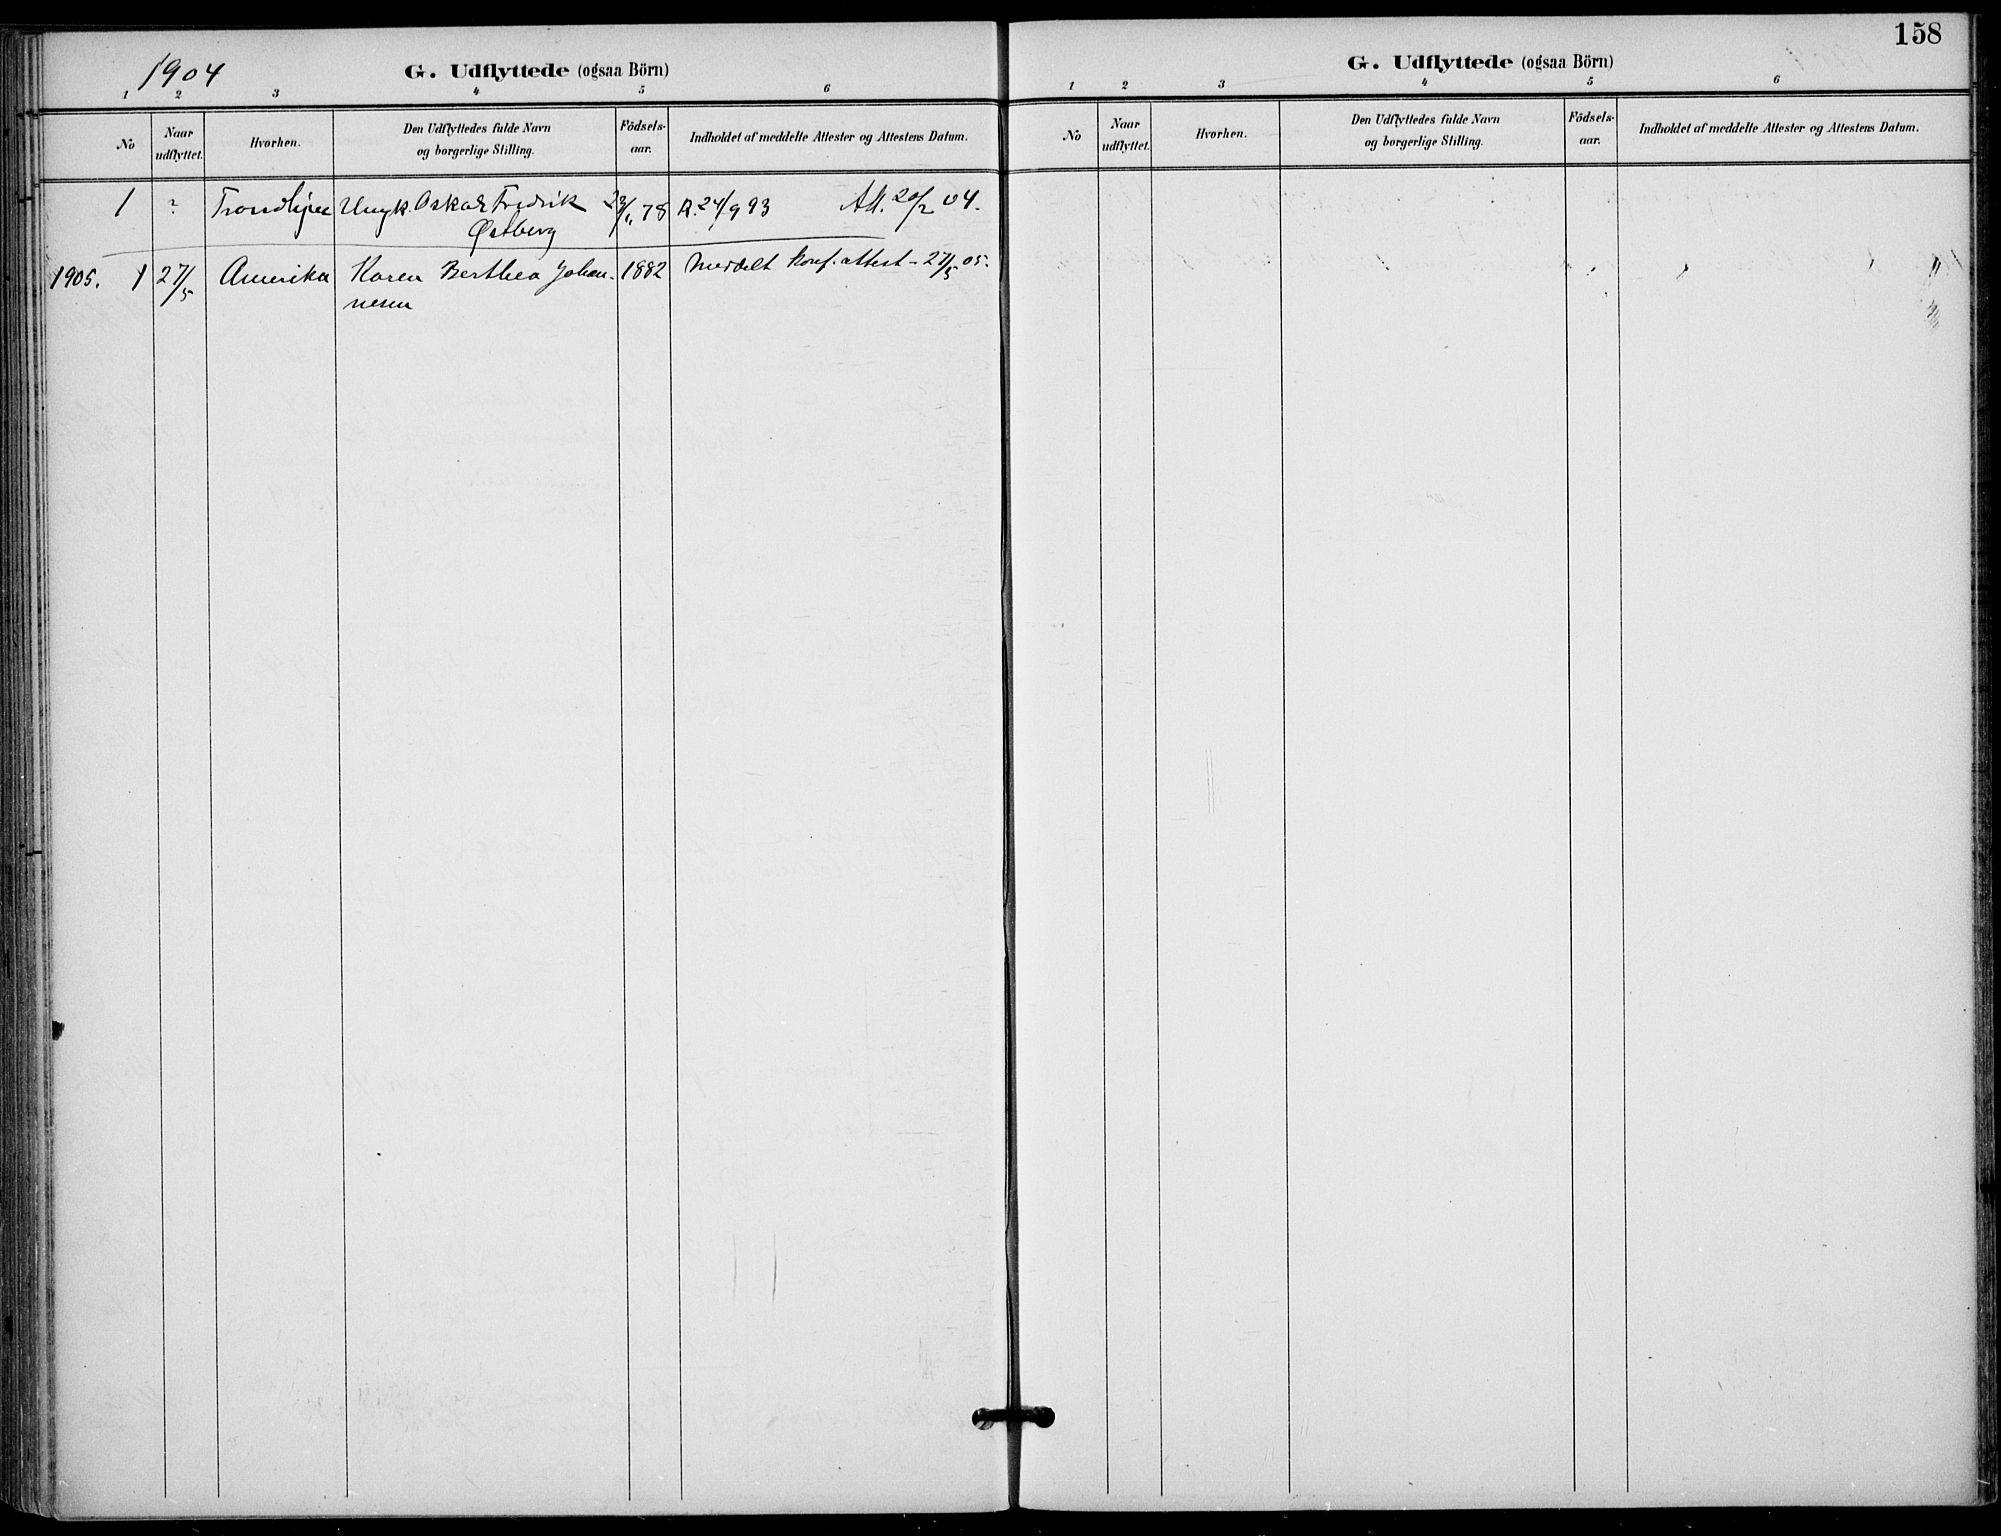 SAKO, Langesund kirkebøker, F/Fa/L0003: Ministerialbok nr. 3, 1893-1907, s. 158